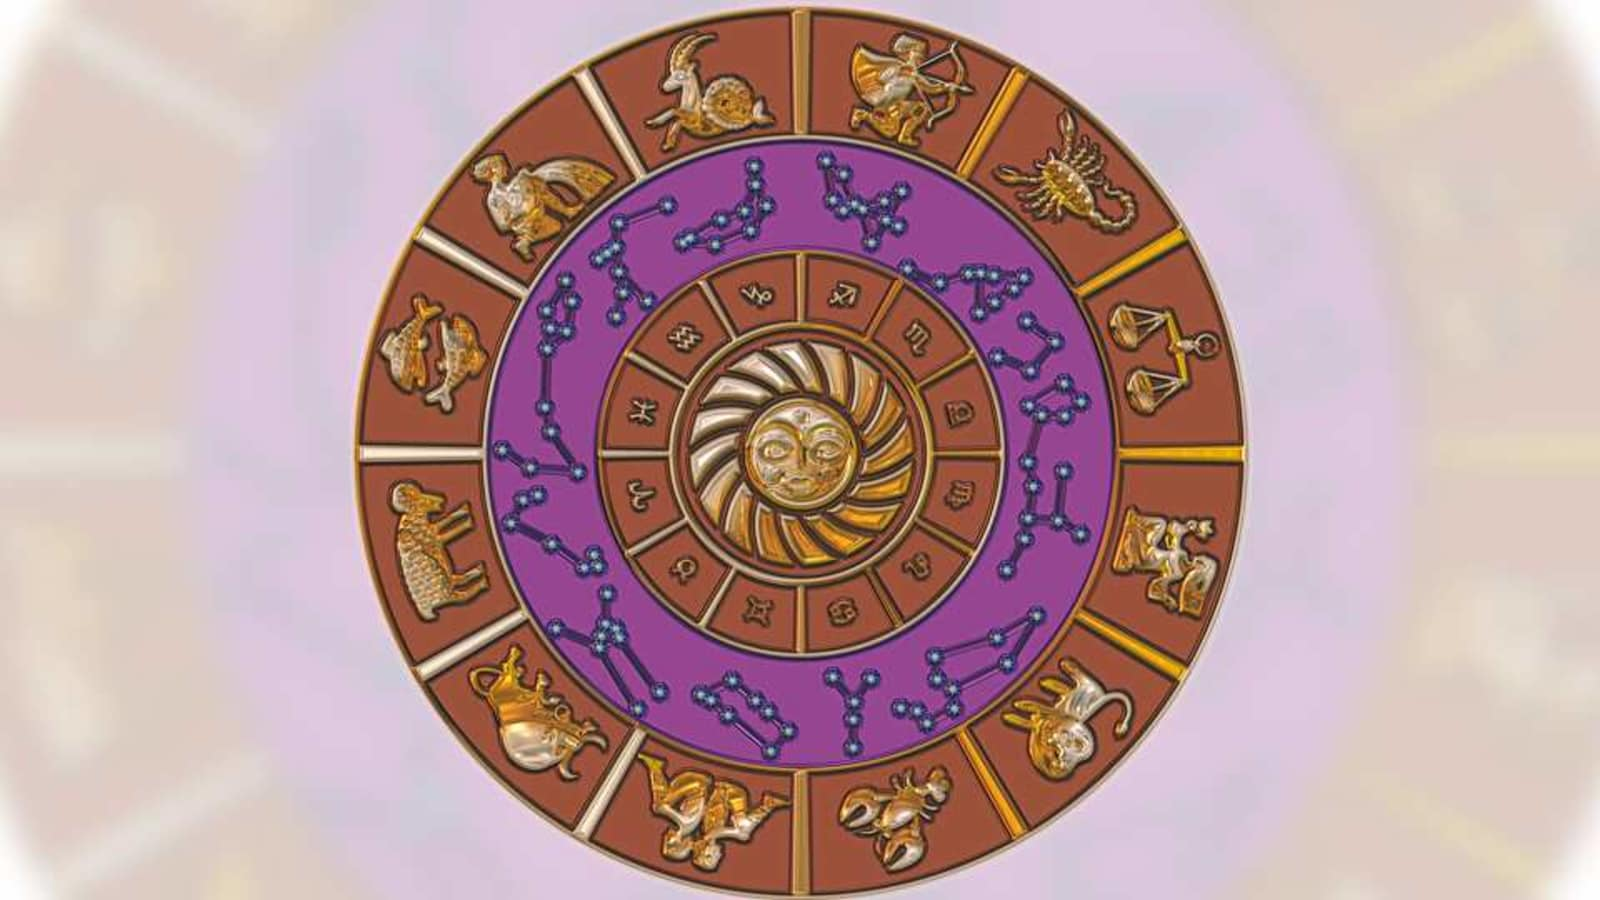 hindustantimes.com - Dr Prem Kumar Sharma - Horoscope Today: Astrological prediction for January 19